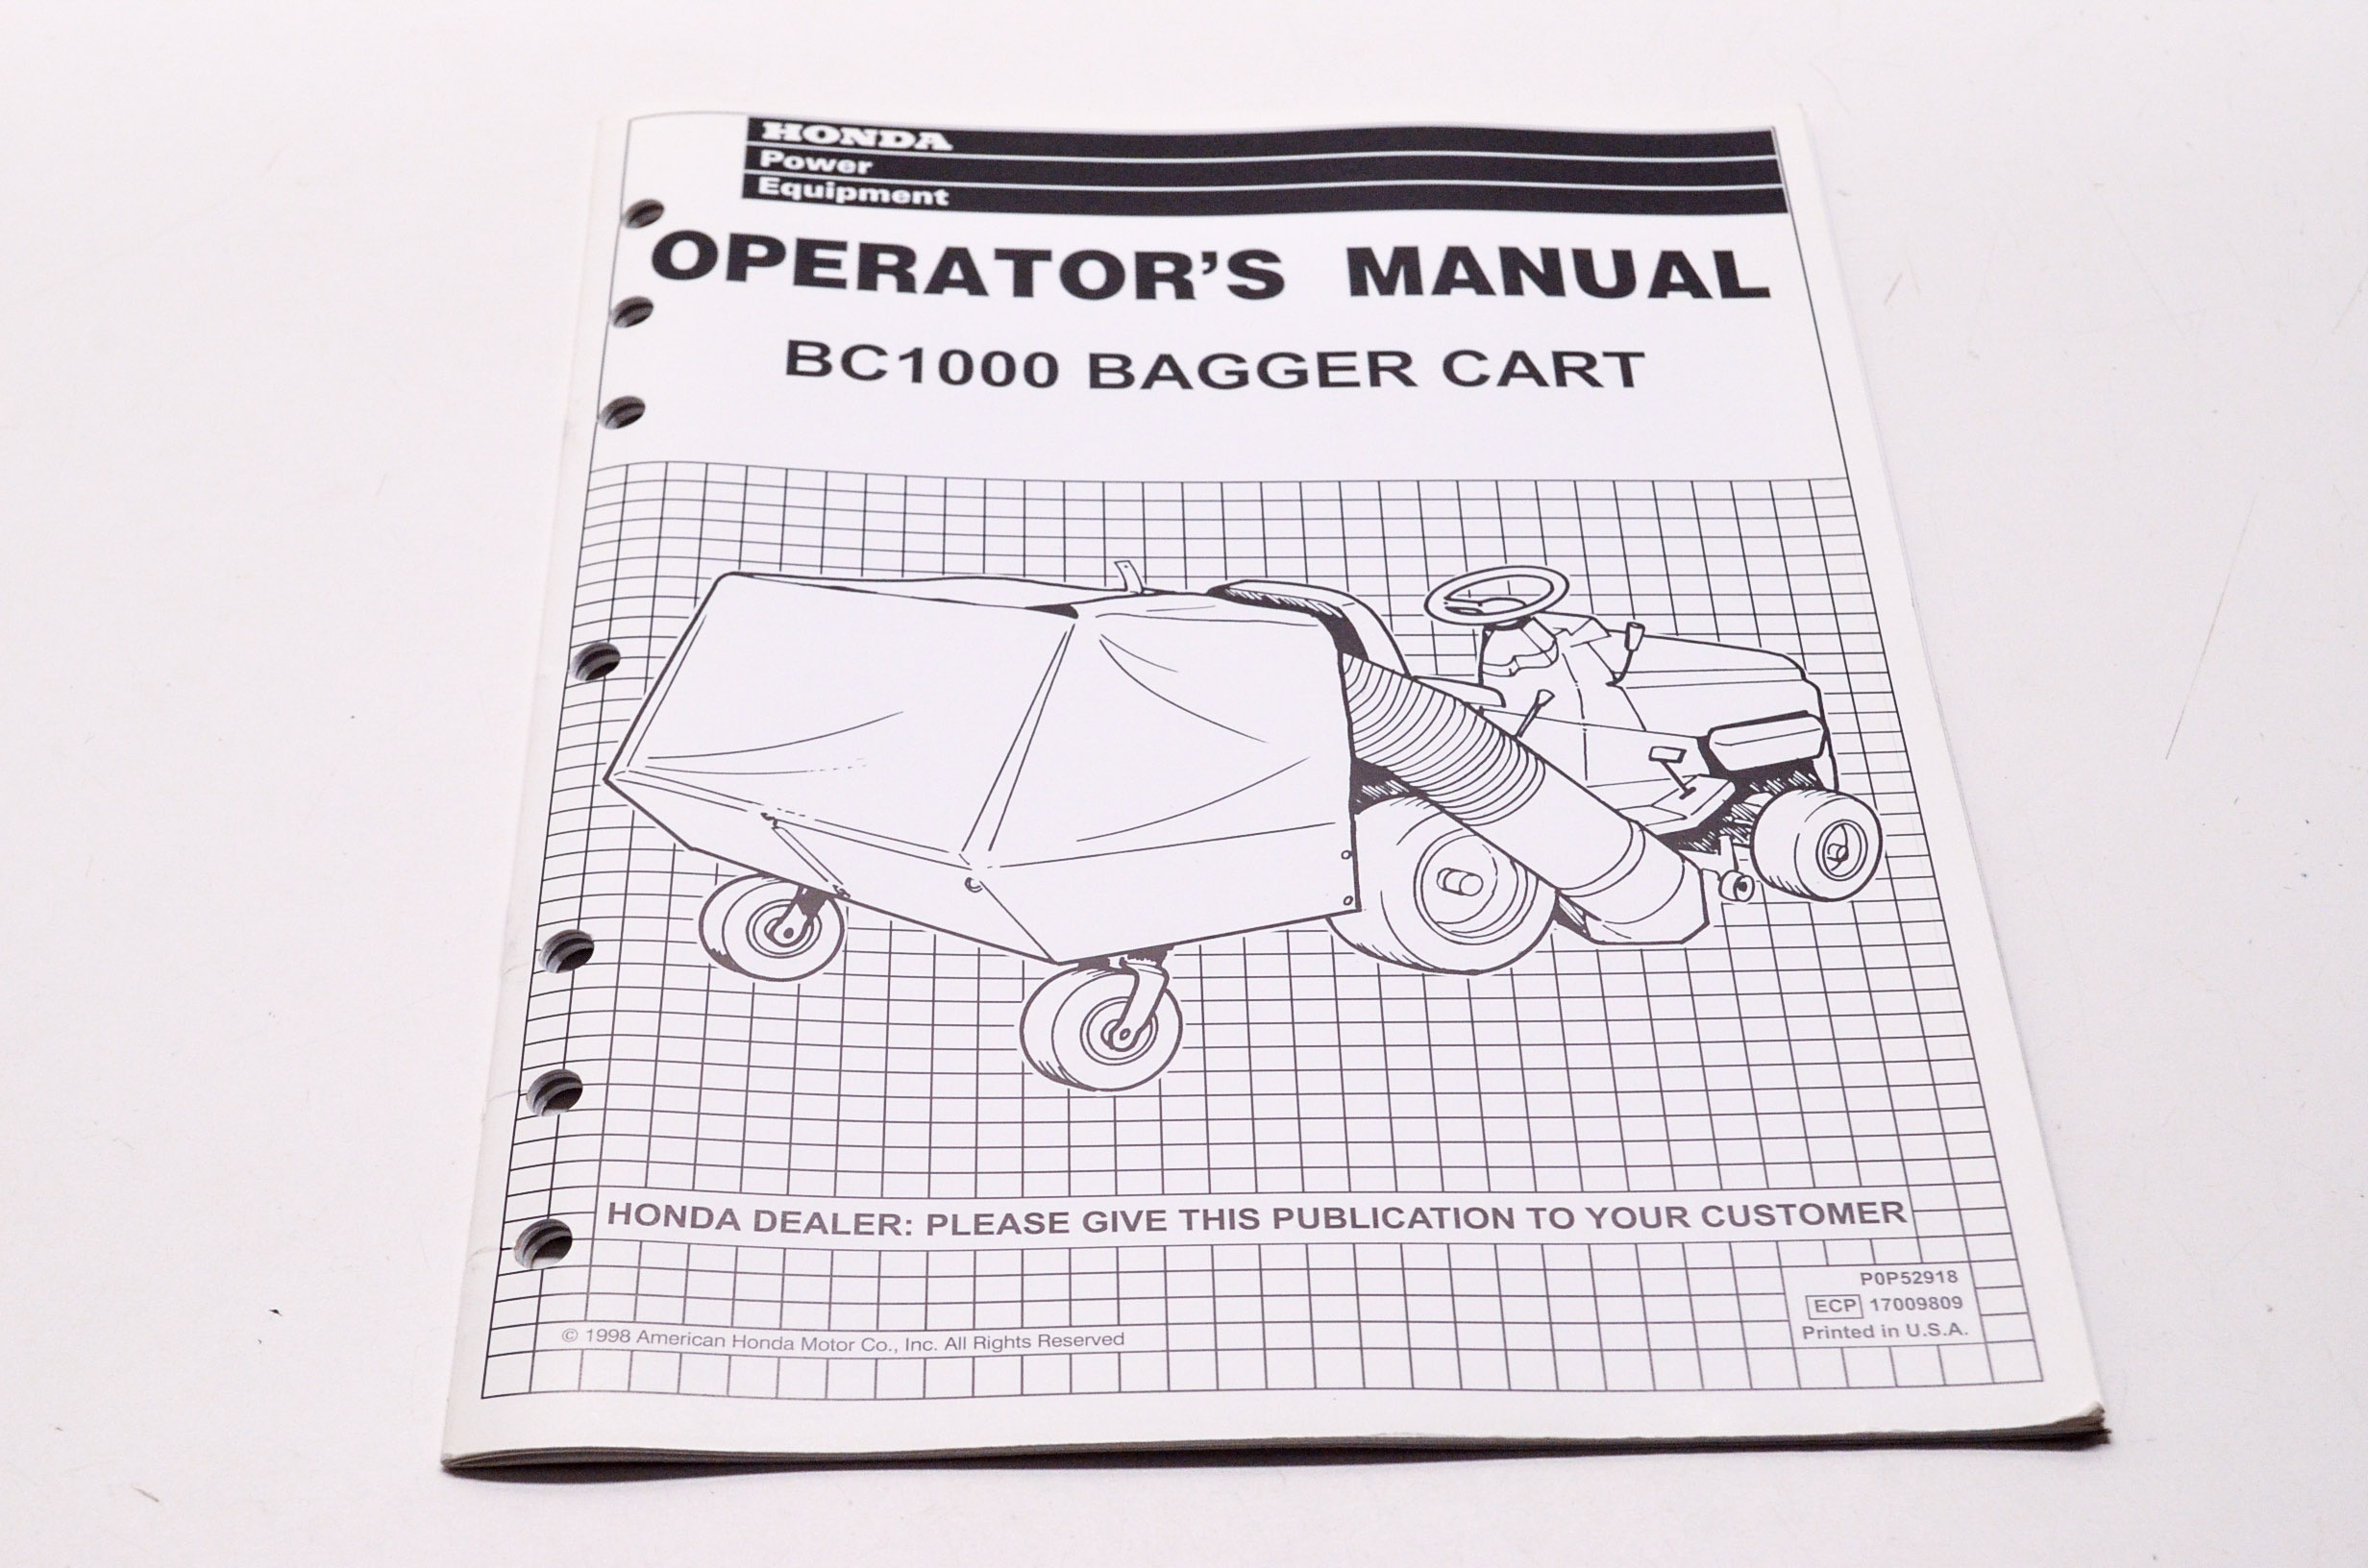 OEM Honda P0P52918, 17009809 Operator's Manual BC1000